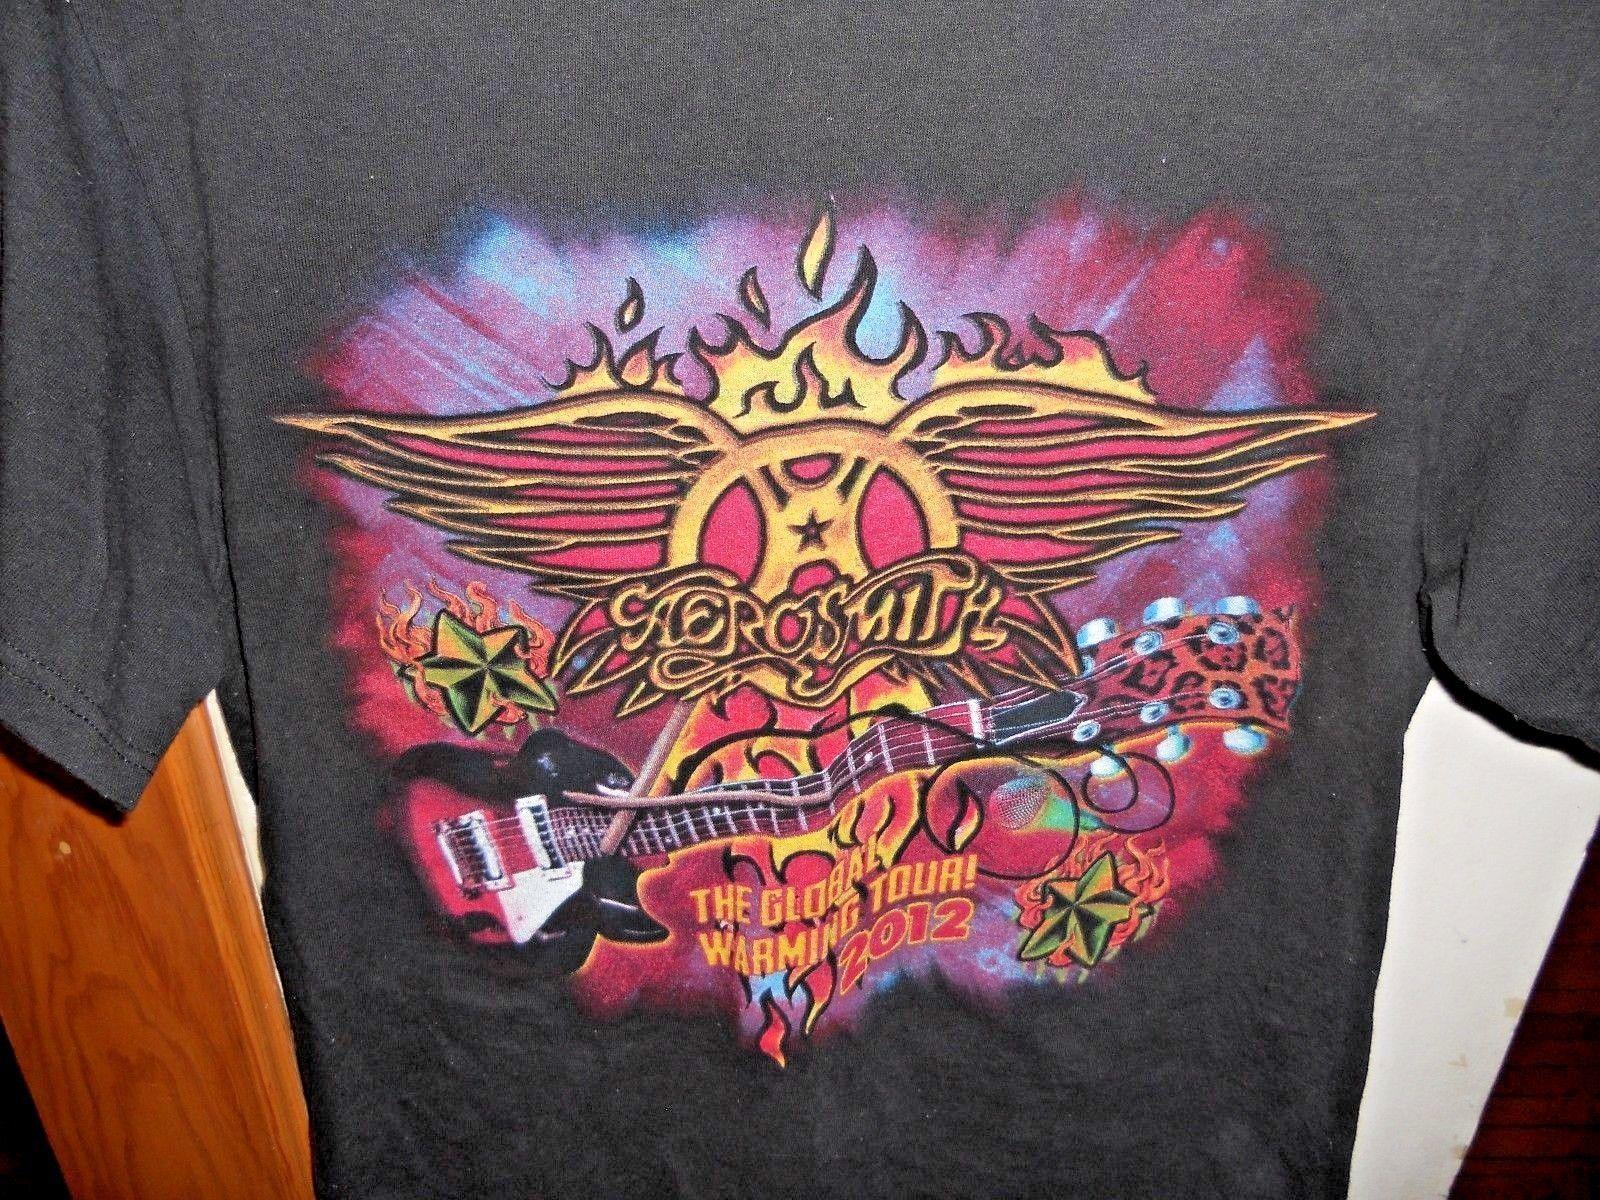 Vintage Aerosmith Shirt Ebay Aerosmith Shirt T Shirts For Women Shirts